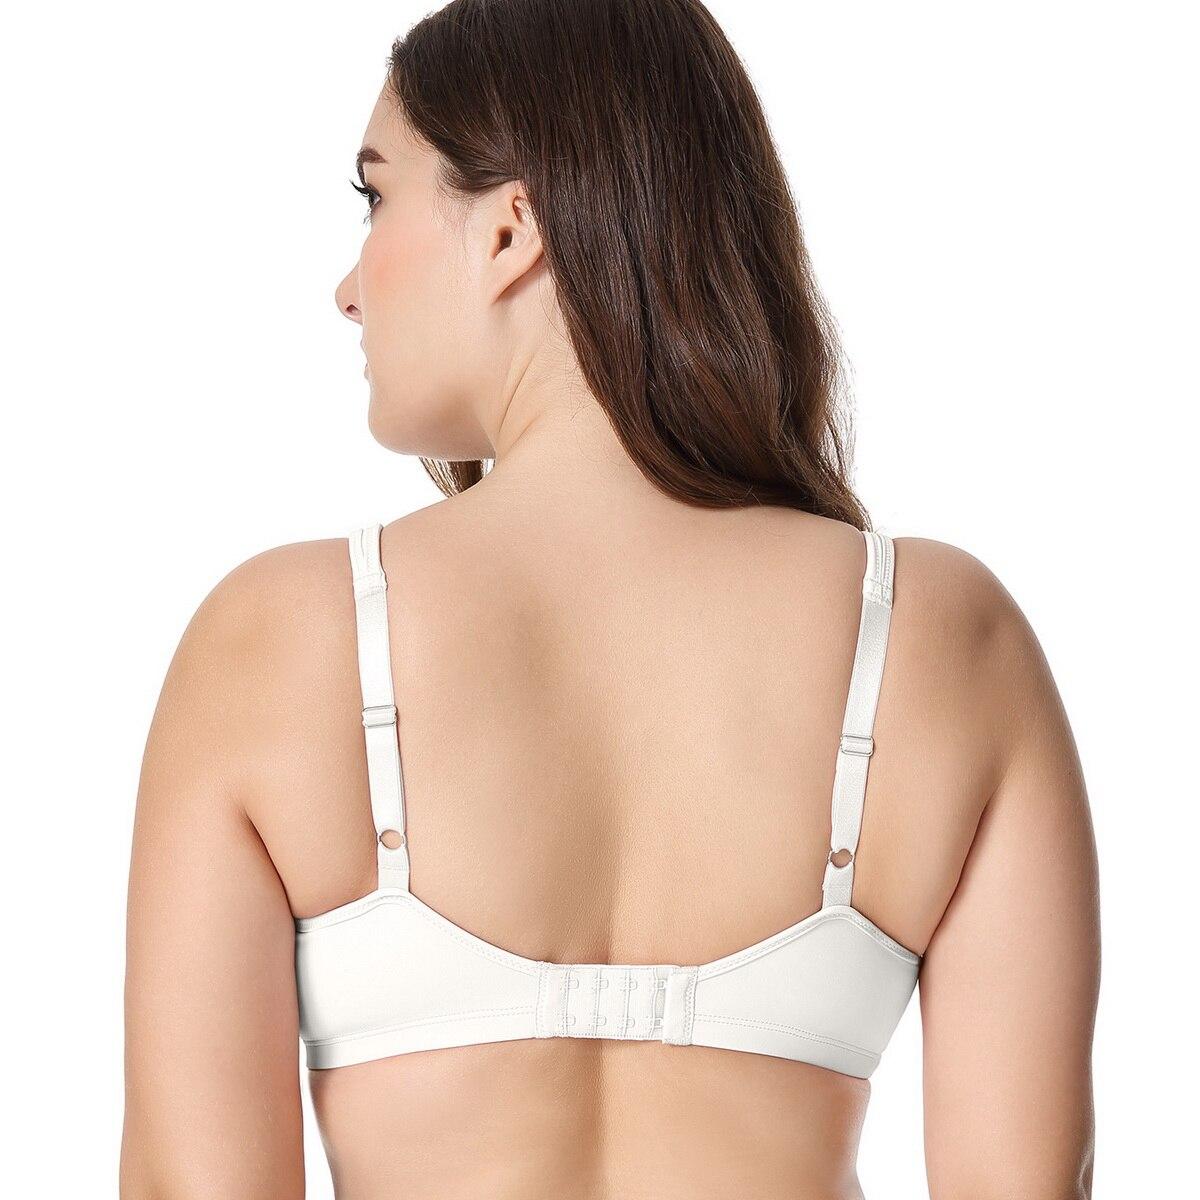 Womens Smooth Full Coverage No Padding Underwire Seamless Plus size Minimizer Bra